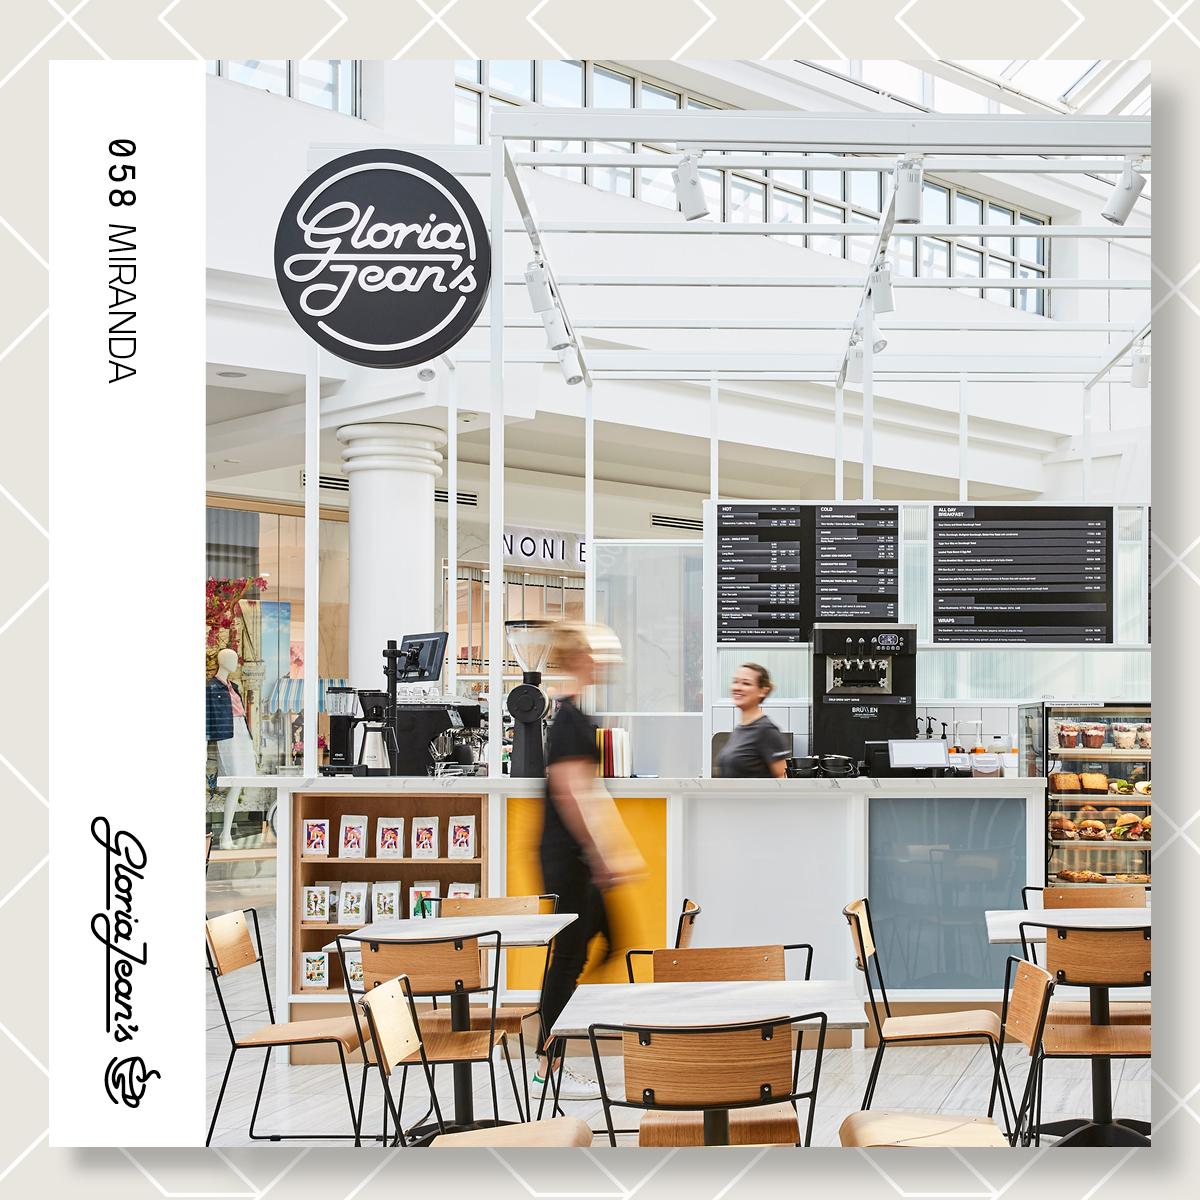 Quality coffee & food for customers on the run! Gloria Jean's Coffees